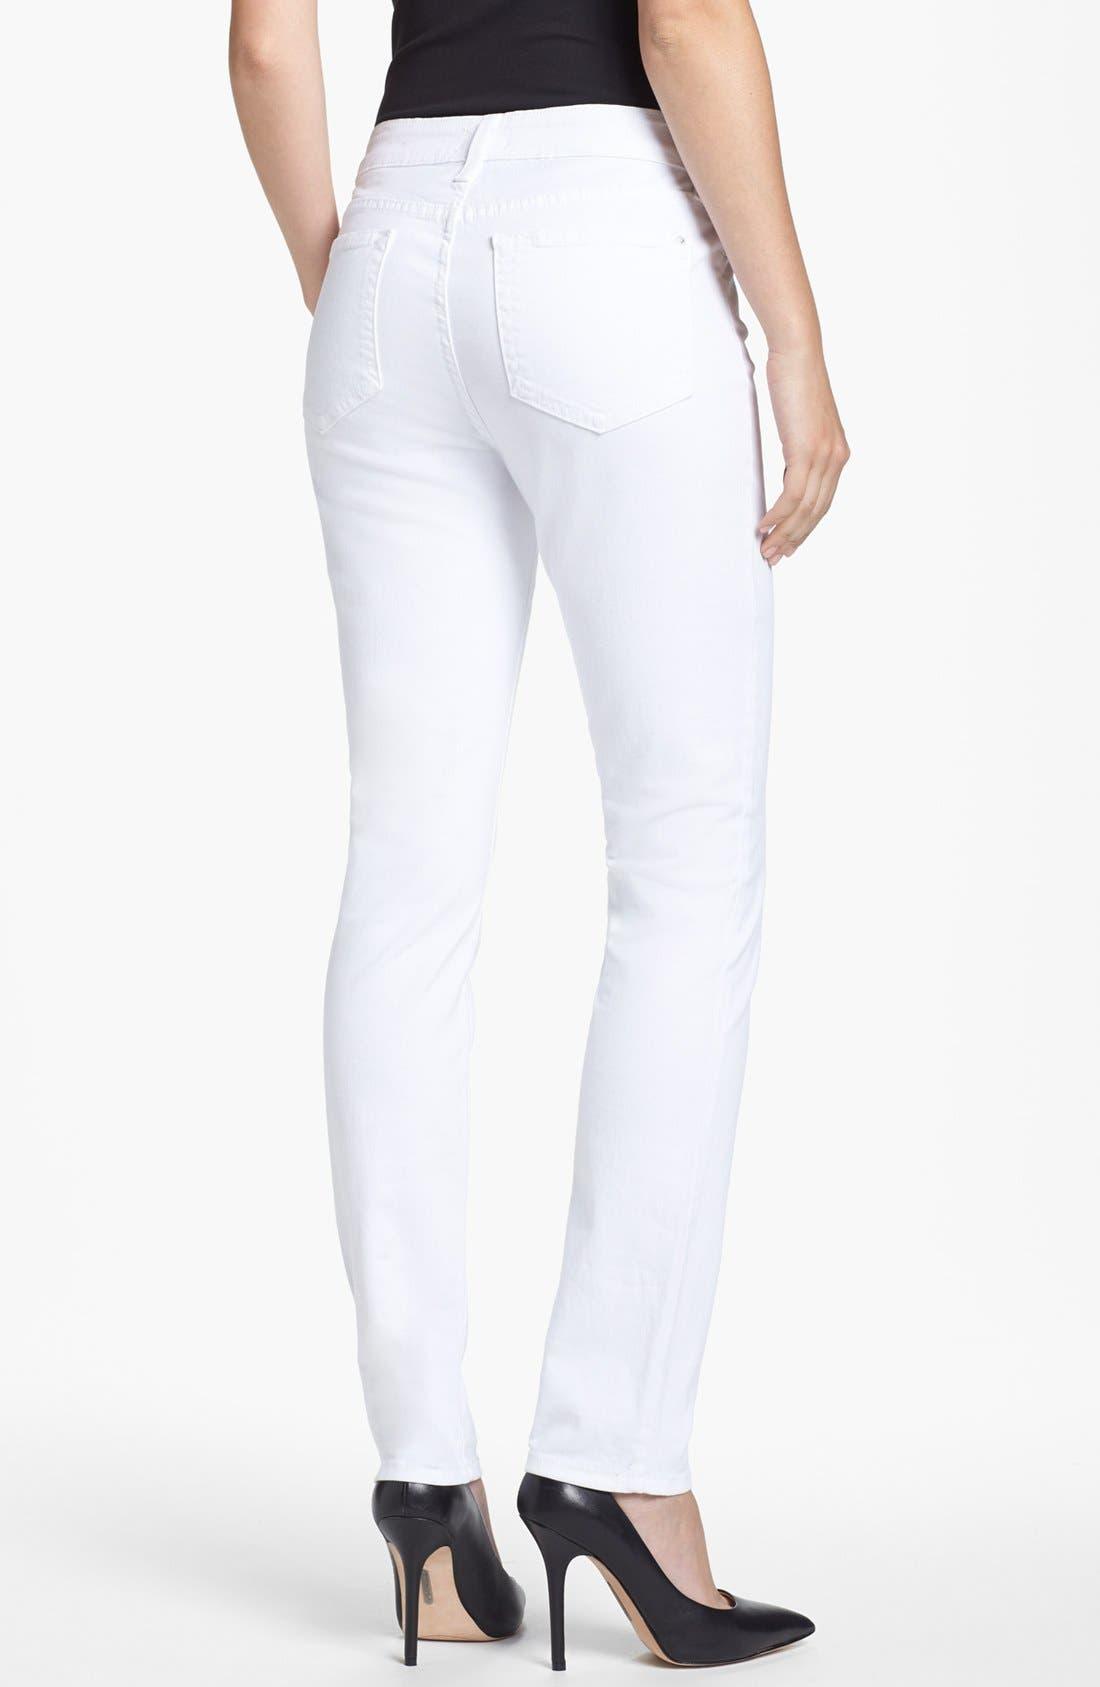 Alternate Image 3  - NYDJ 'Jade' Colored Stretch Skinny Jeans